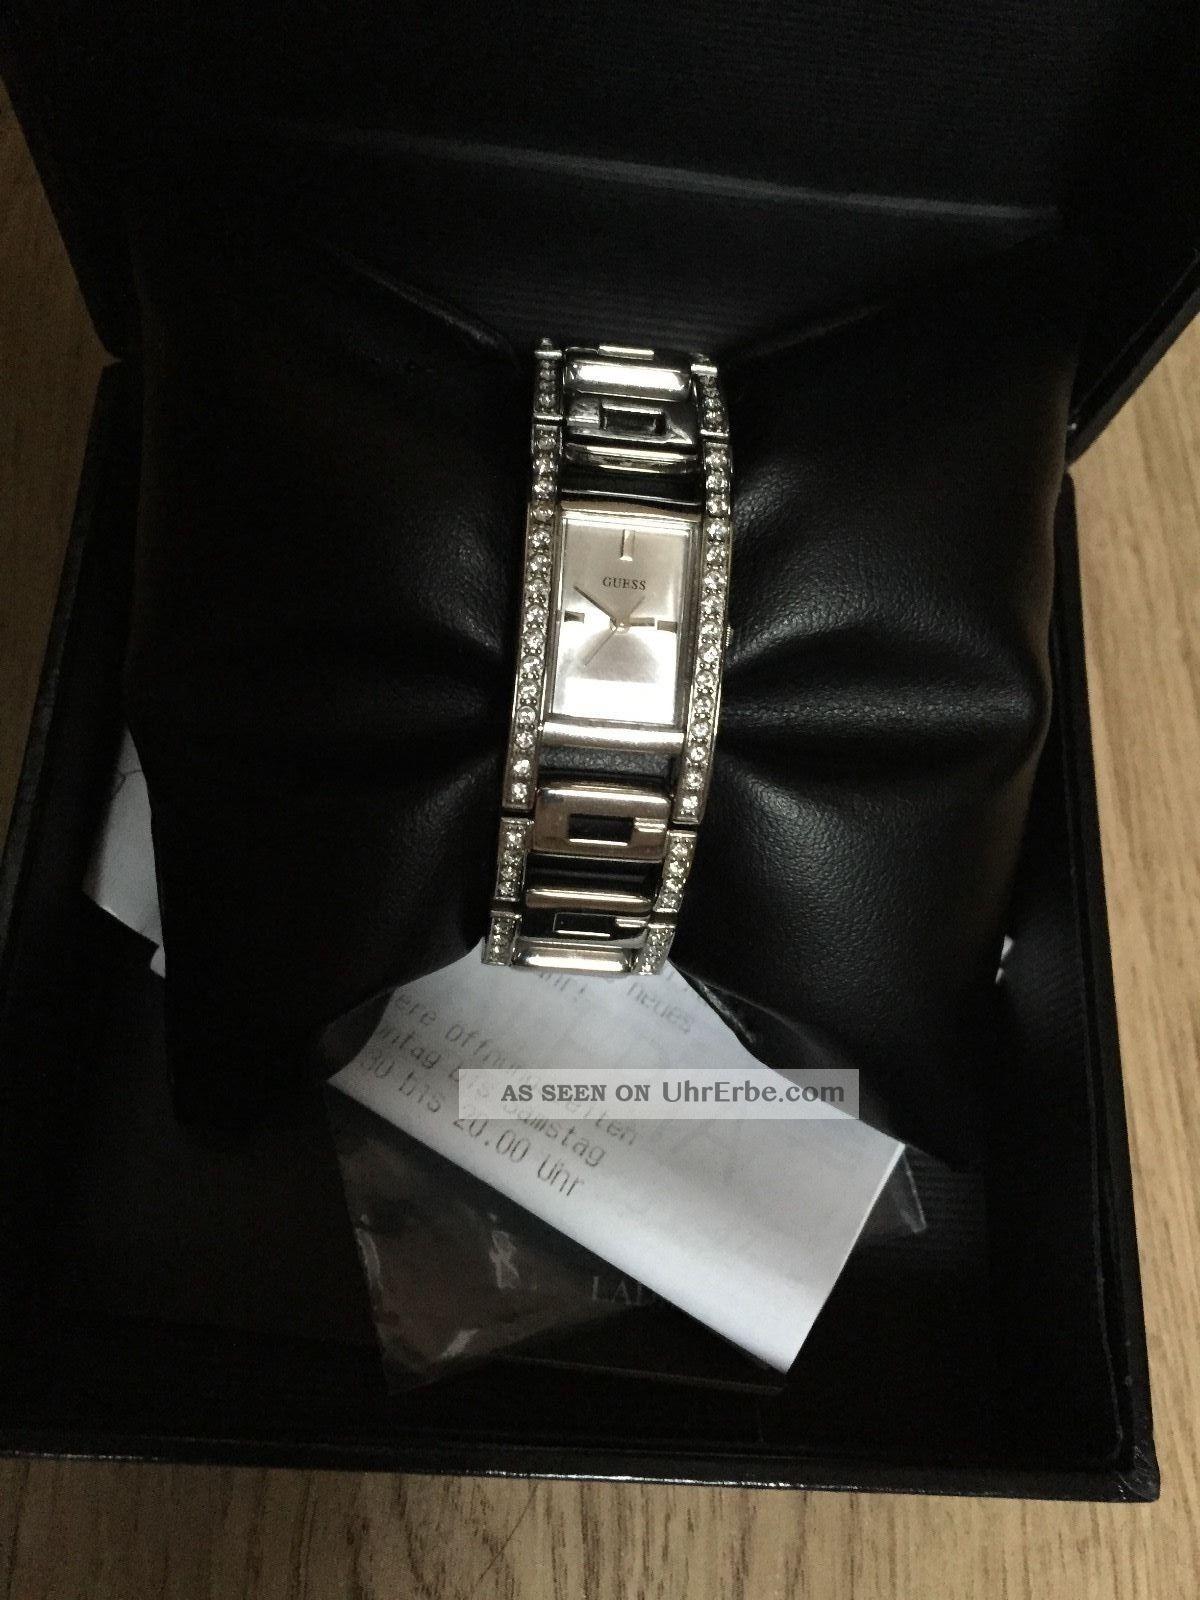 Guess Damen Uhr / Women ' S Watch W11088l1 Mit Rechnung Armbanduhren Bild